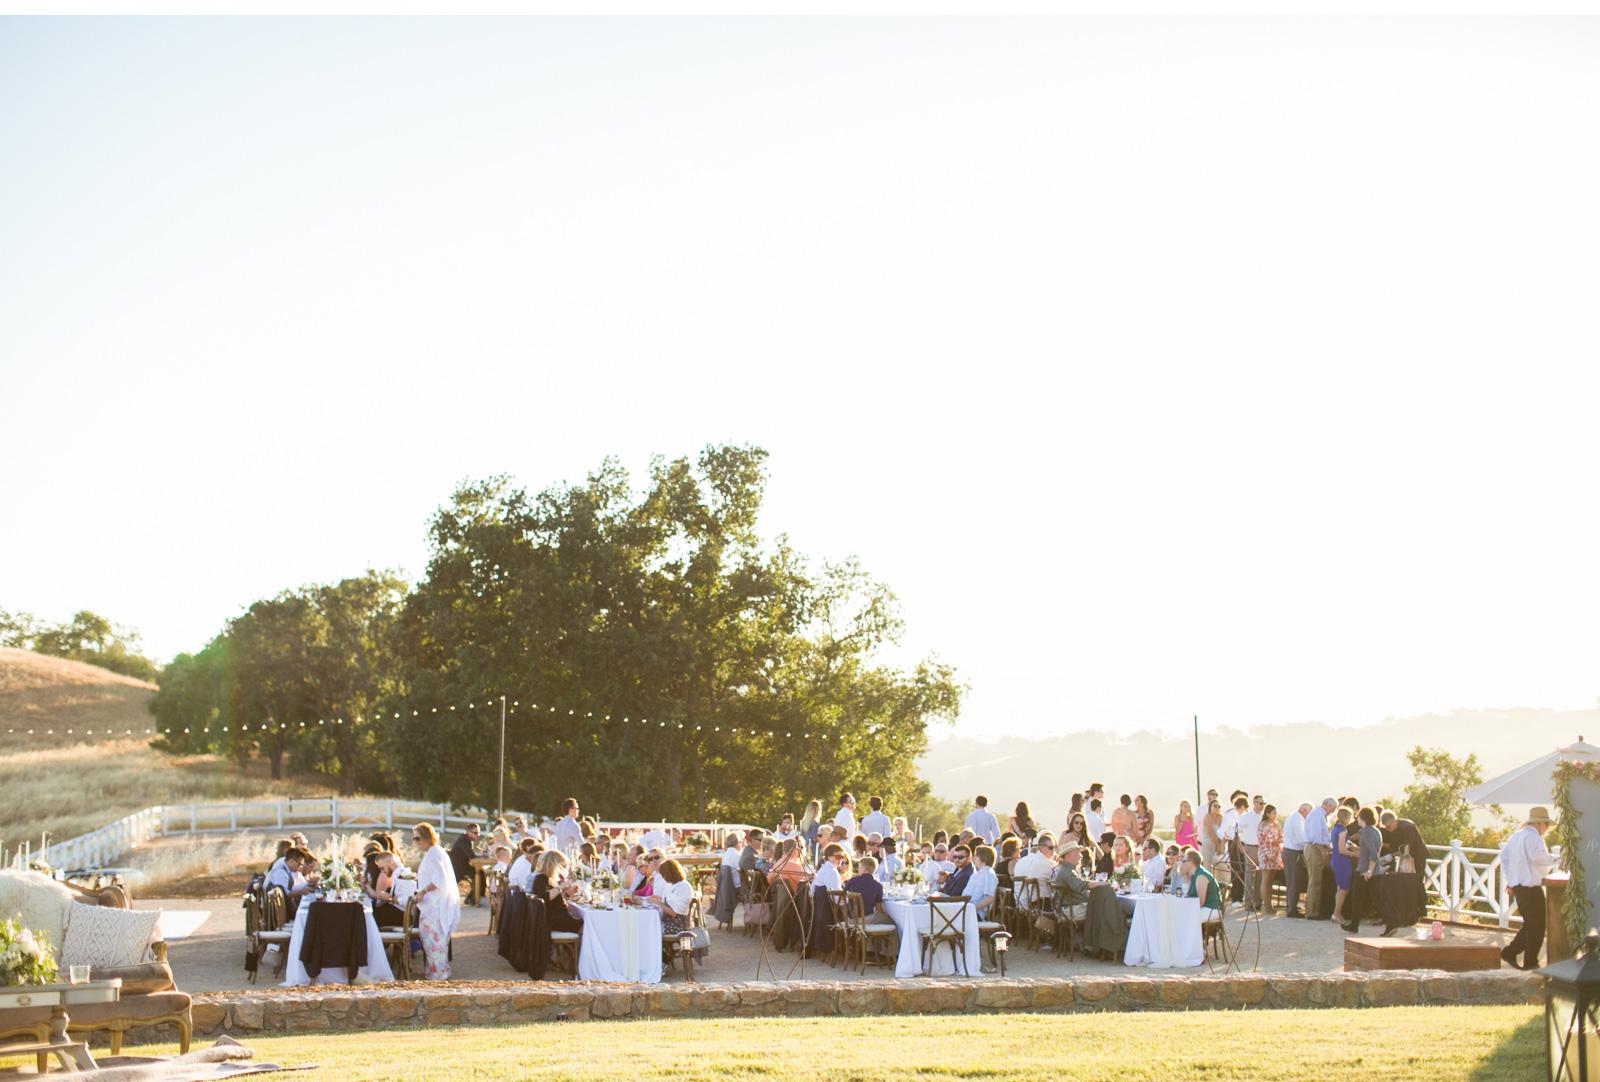 Natalie-Schutt-Photography's-Wedding-Style-Me-Pretty-Paso-Robles_08.jpg